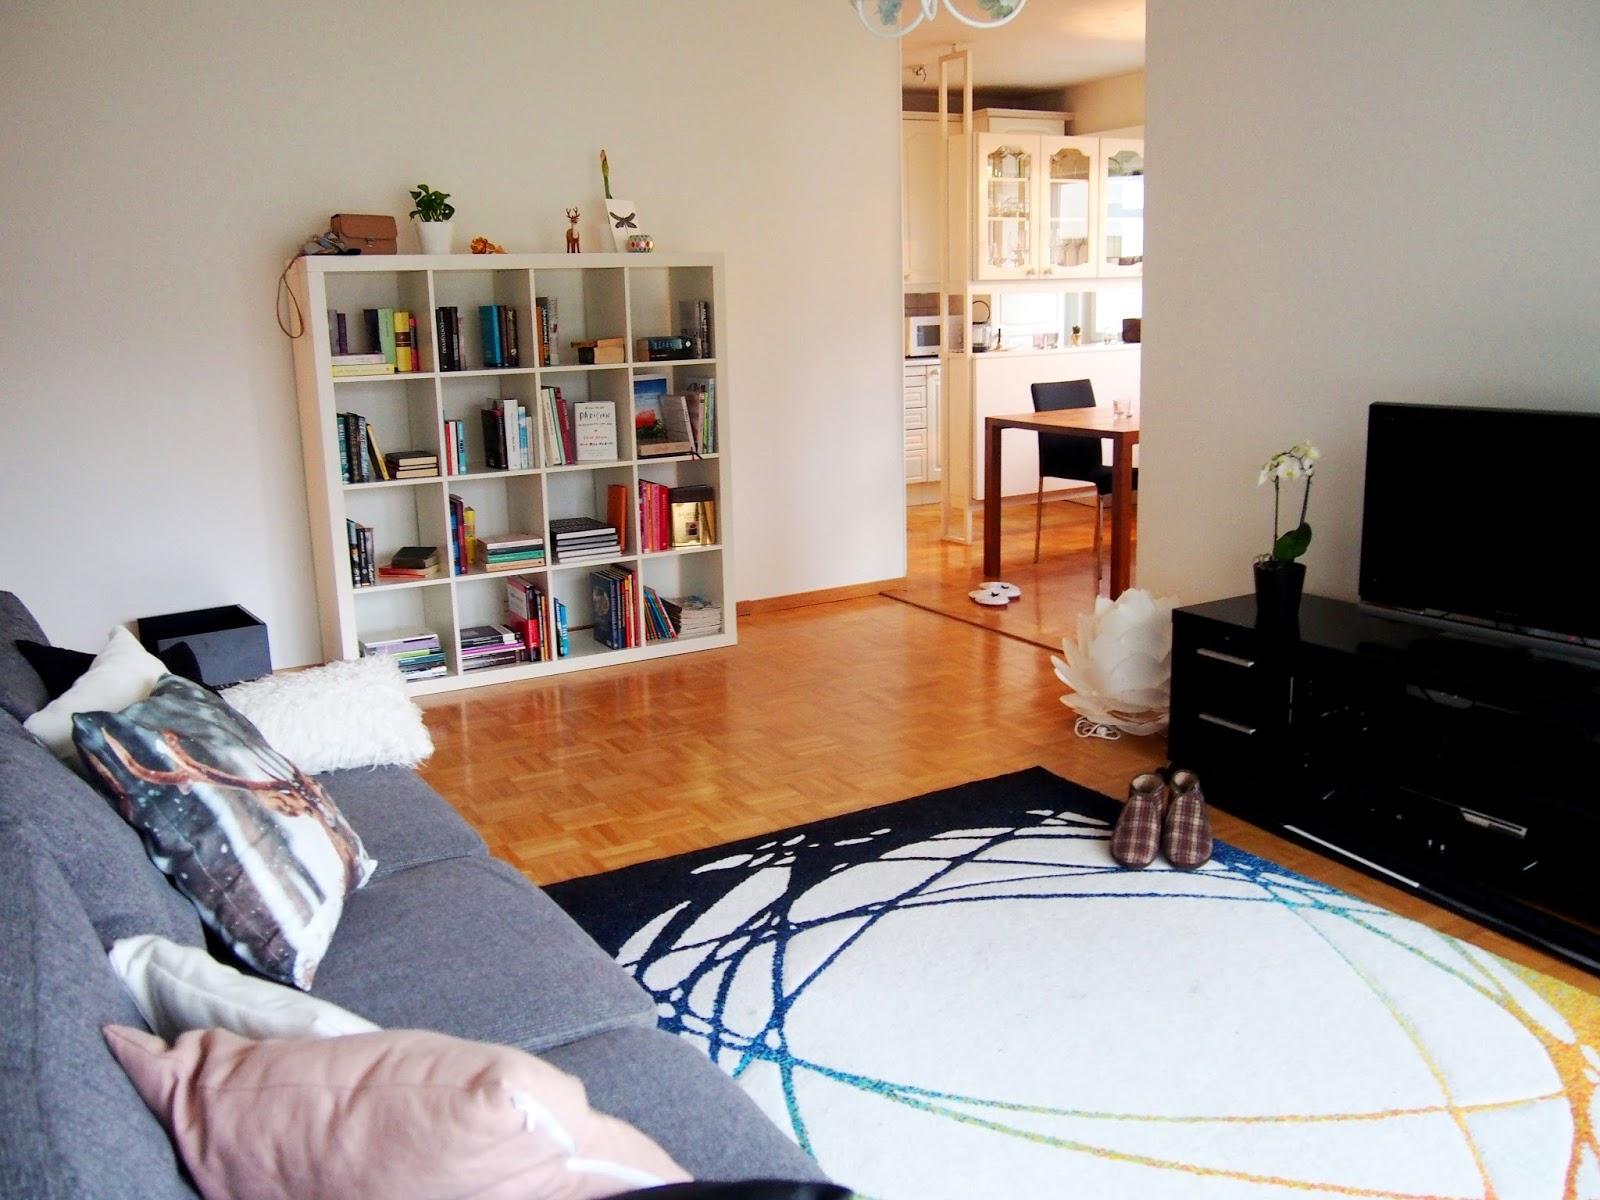 moving muutto uusi asunto new apartment home koti sisustus interior decor bookcase kirjahylly olohuone livingroom dining ruokatila